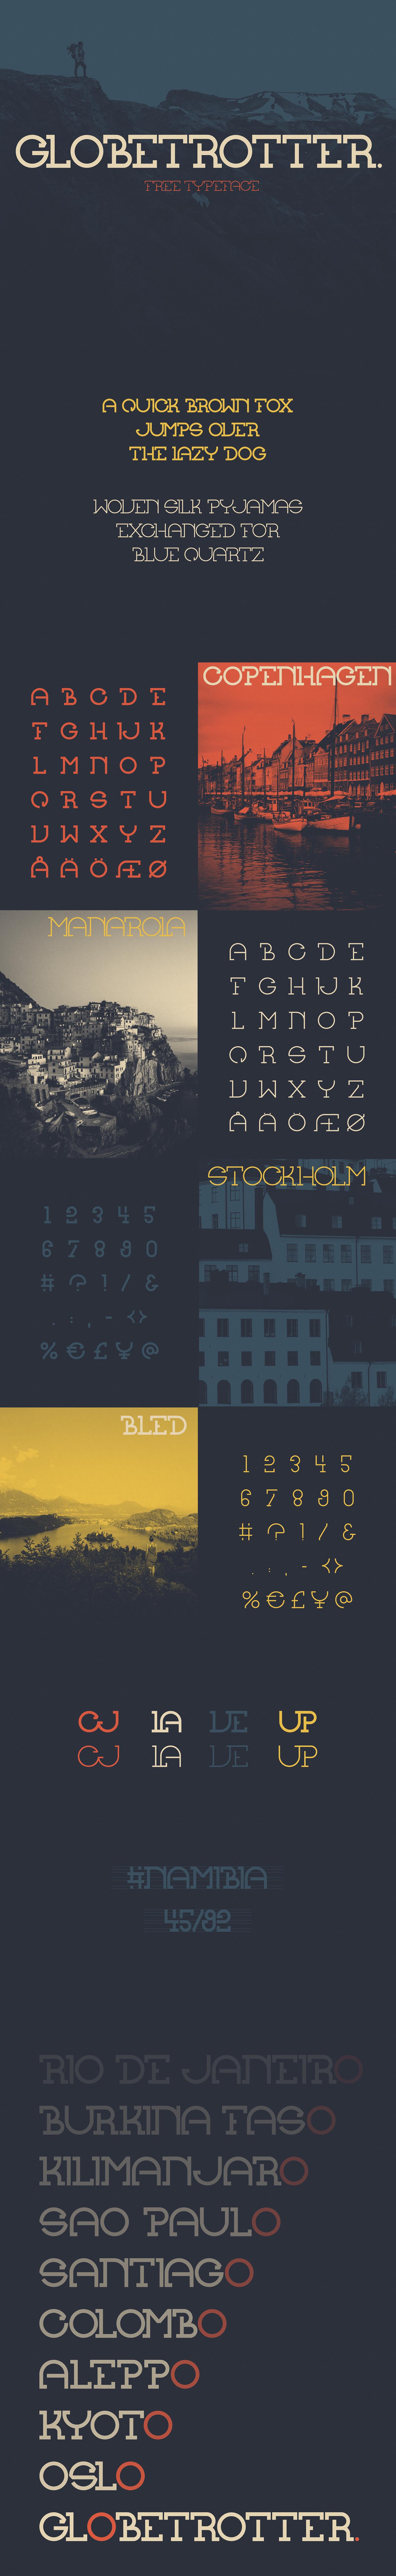 Globetrotter Typeface